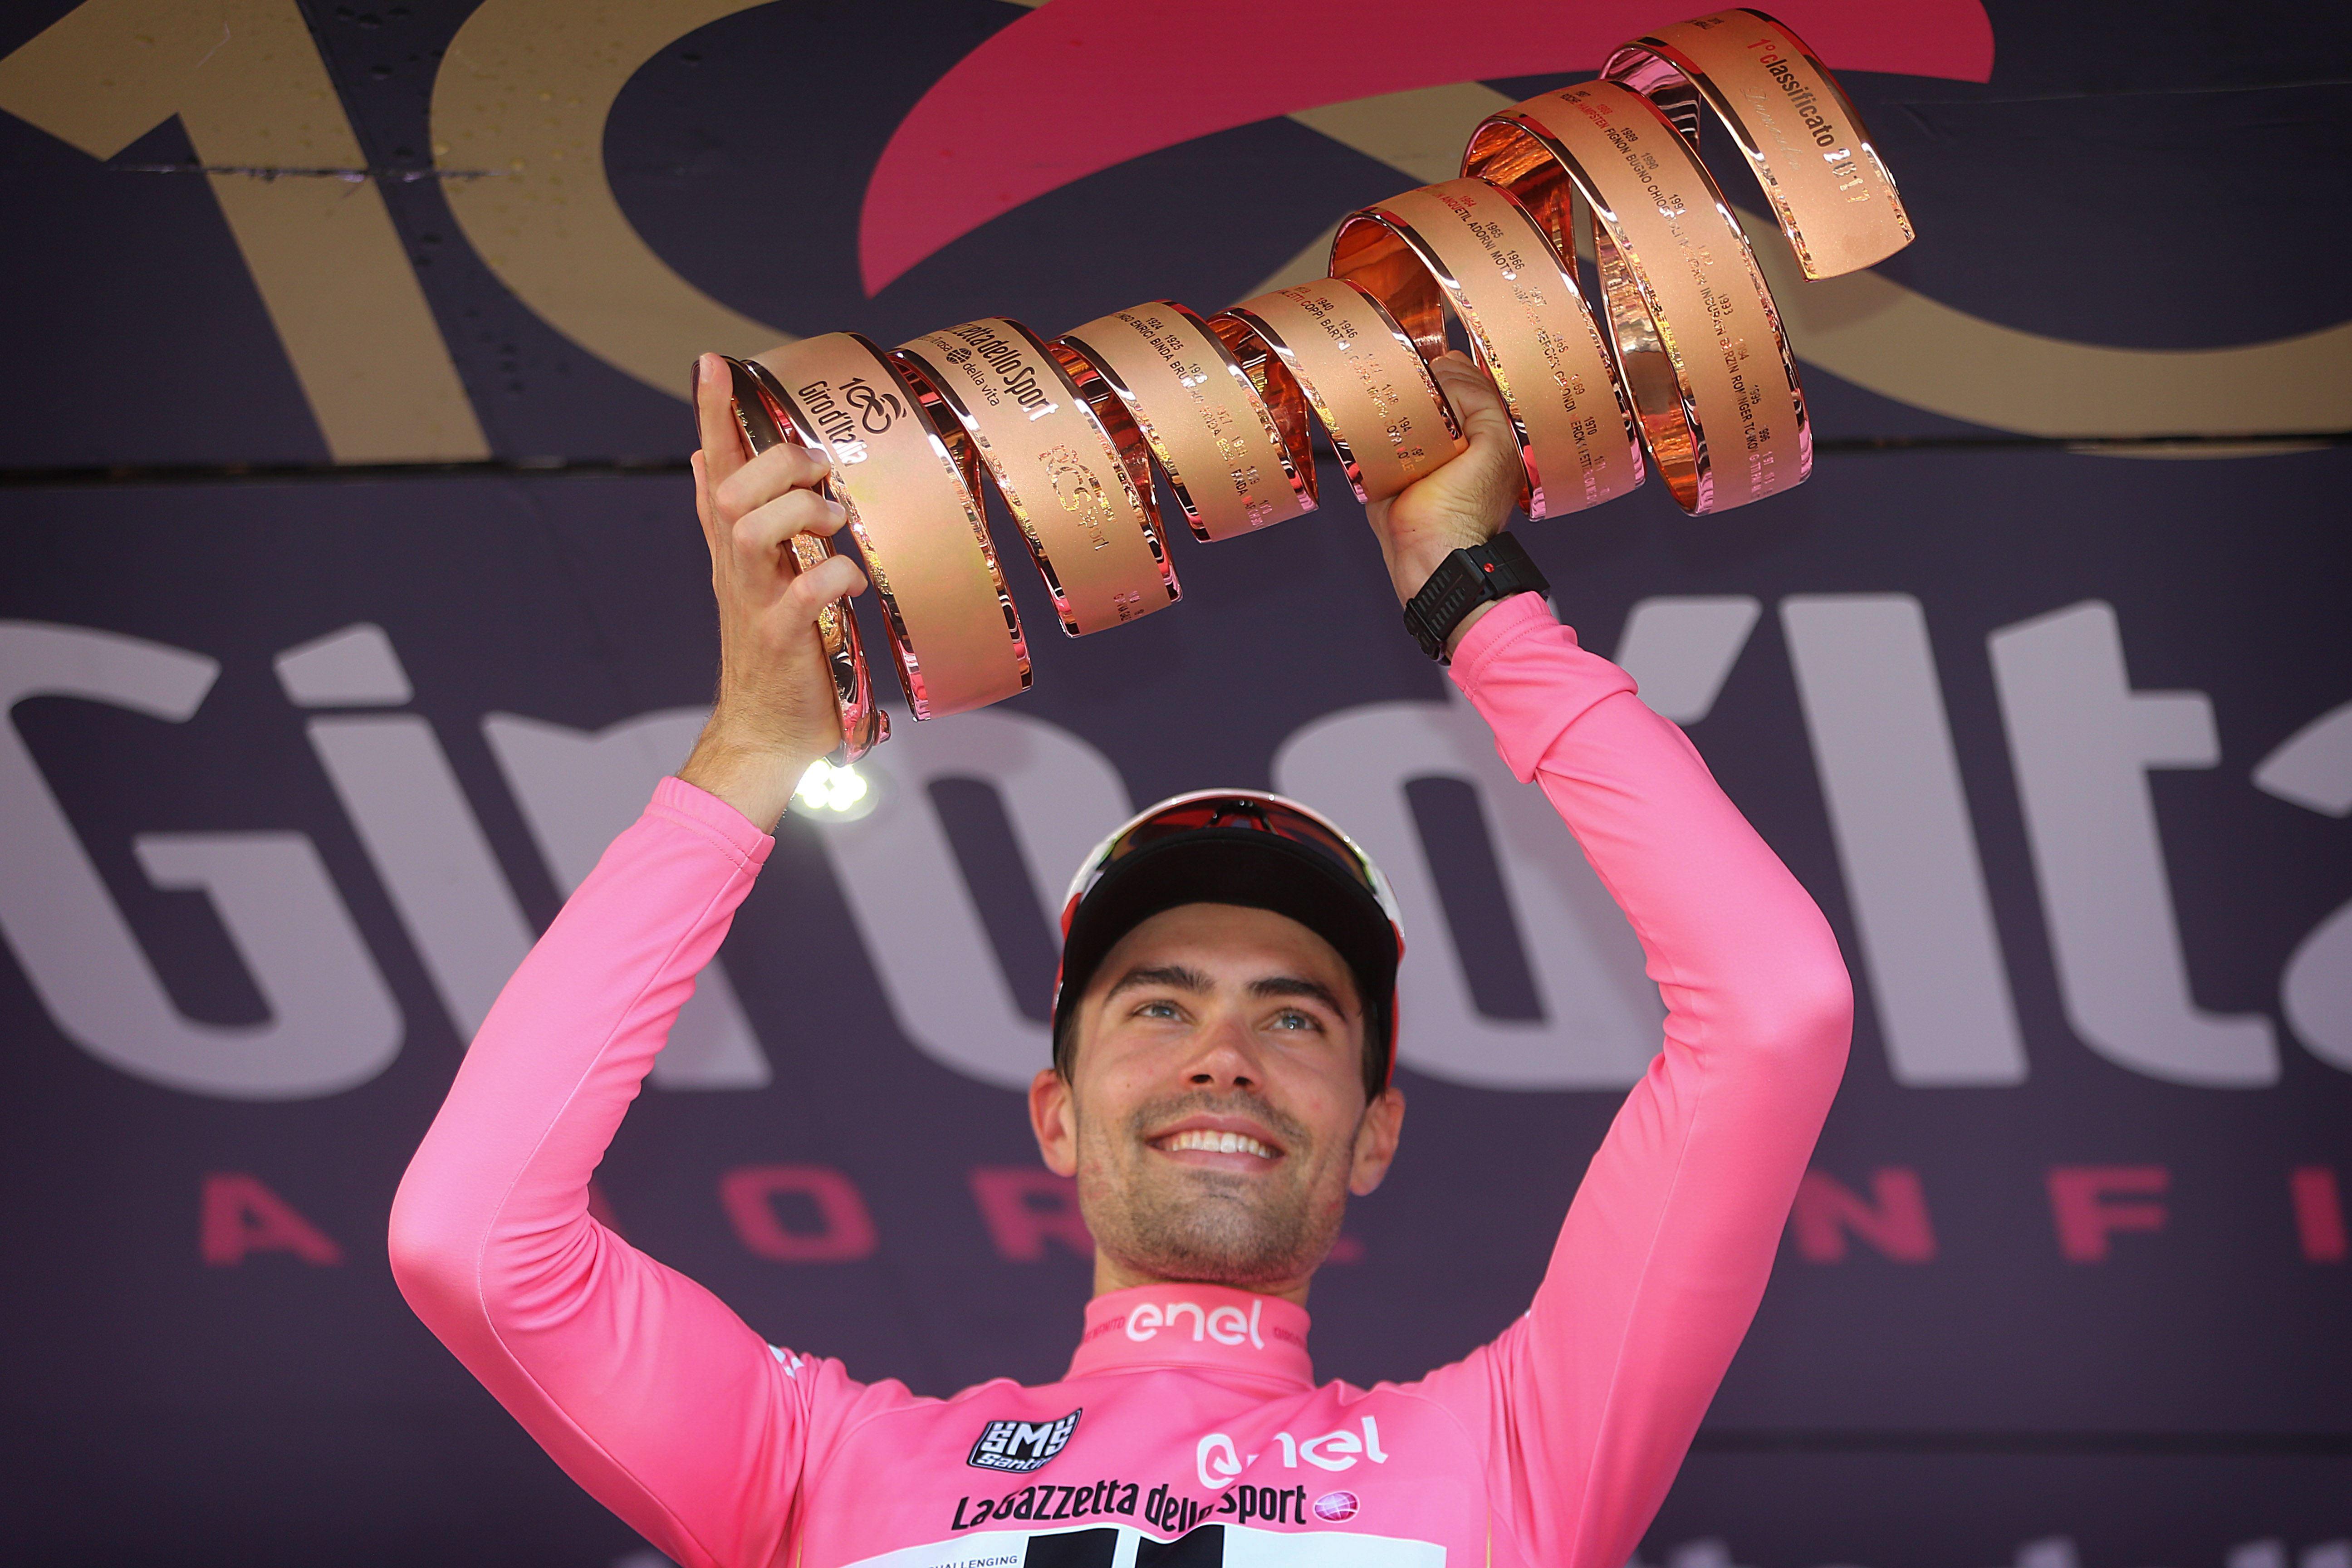 Sieger des 100. Giro d'Italia: Tom Dumoulin (Sunweb) - Foto: © Cor Vos / Team Sunweb